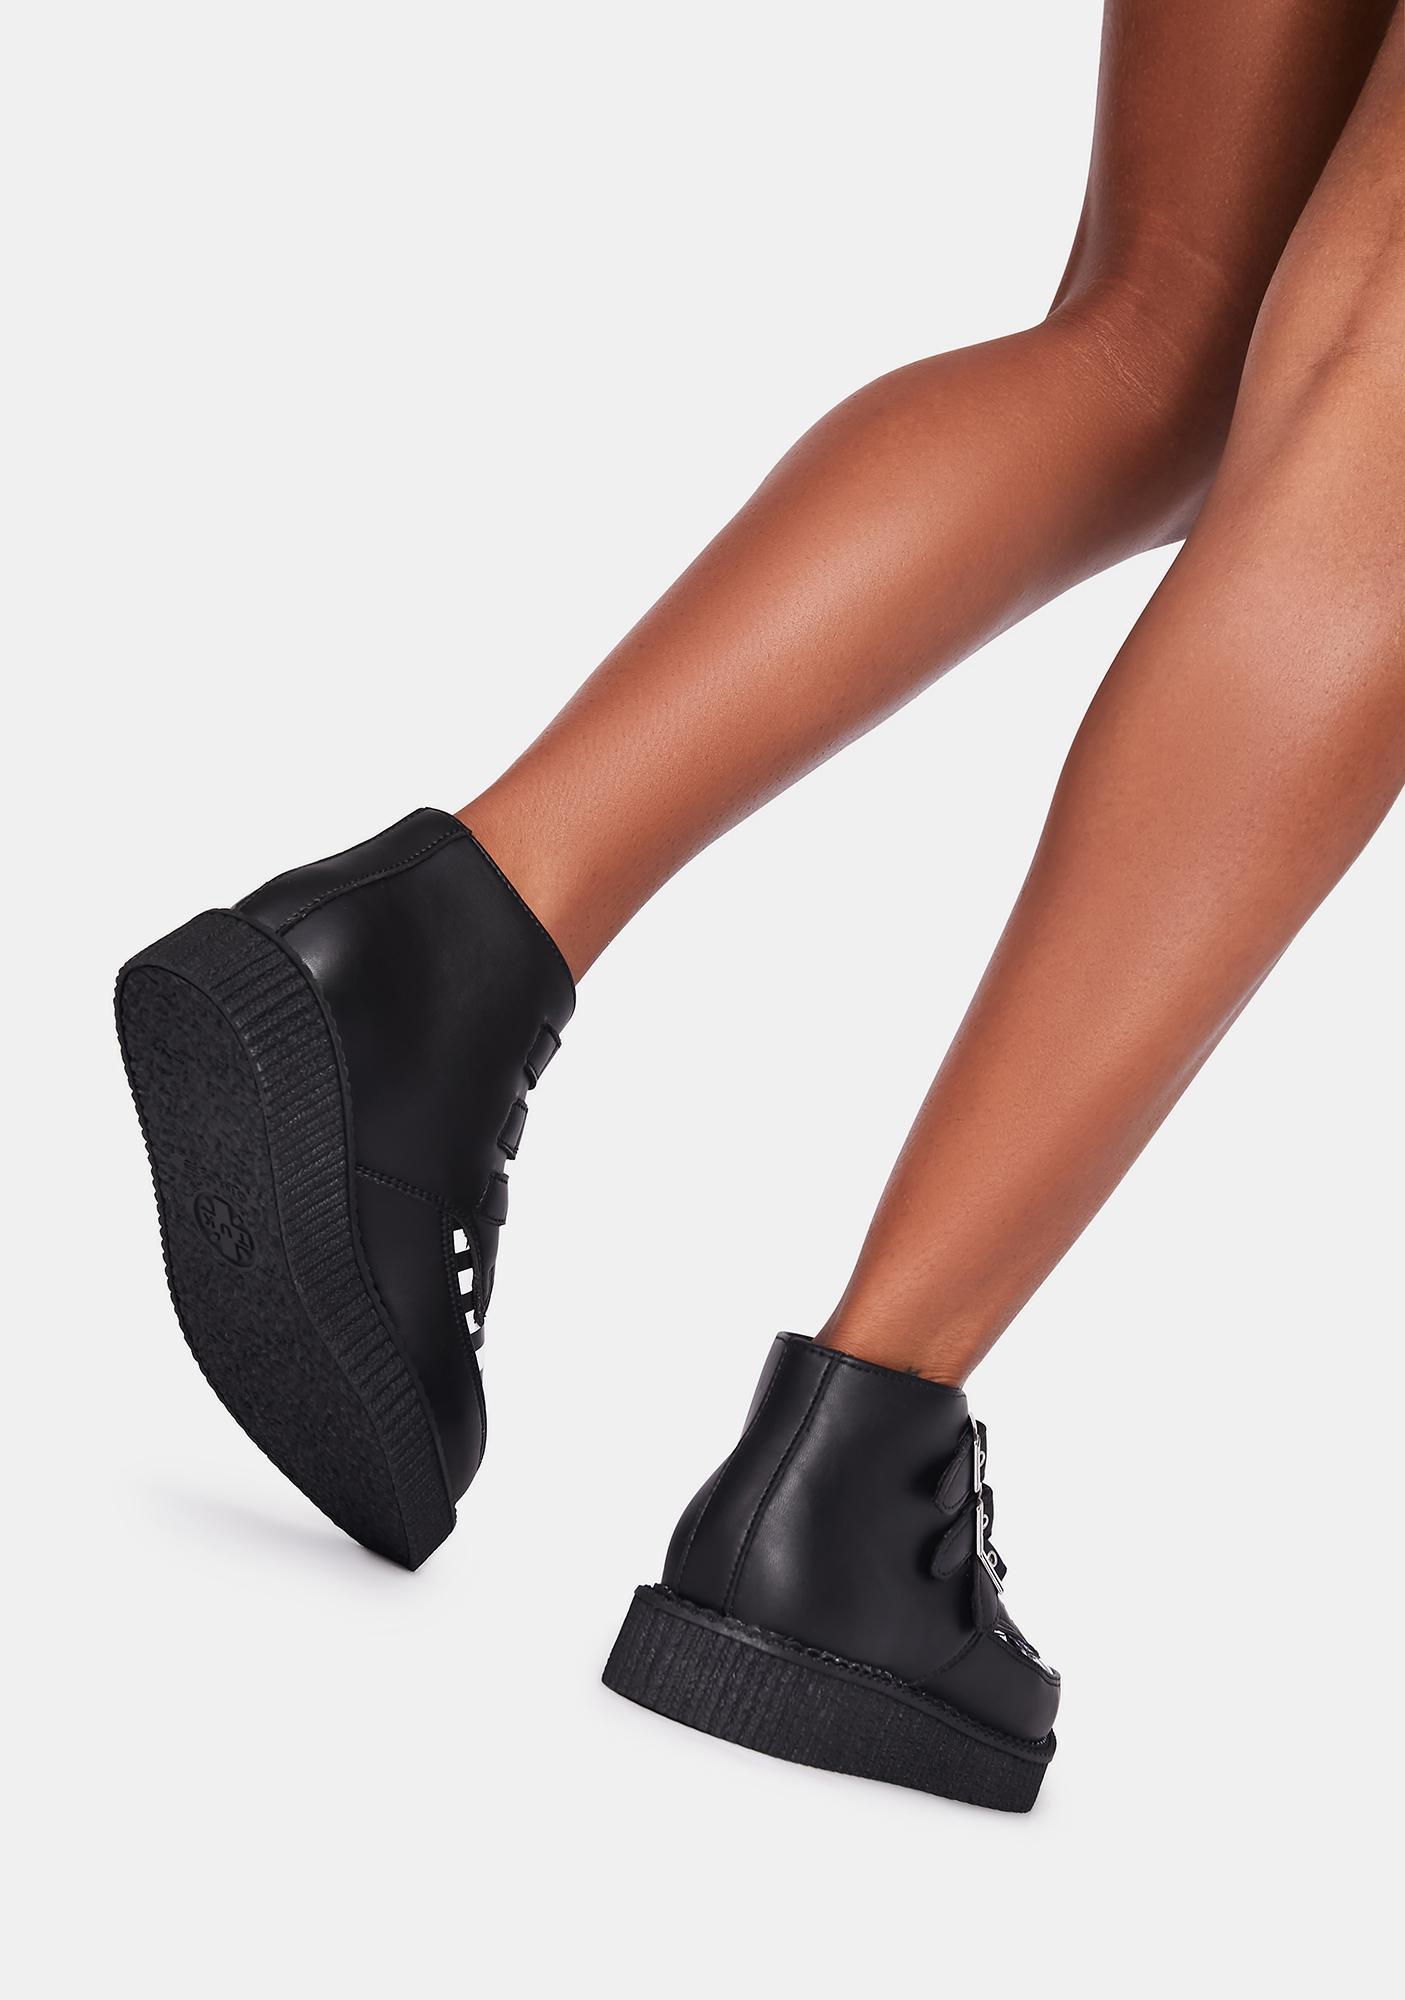 T.U.K. Black & White Stripe 3-Buckle Pointed Boots